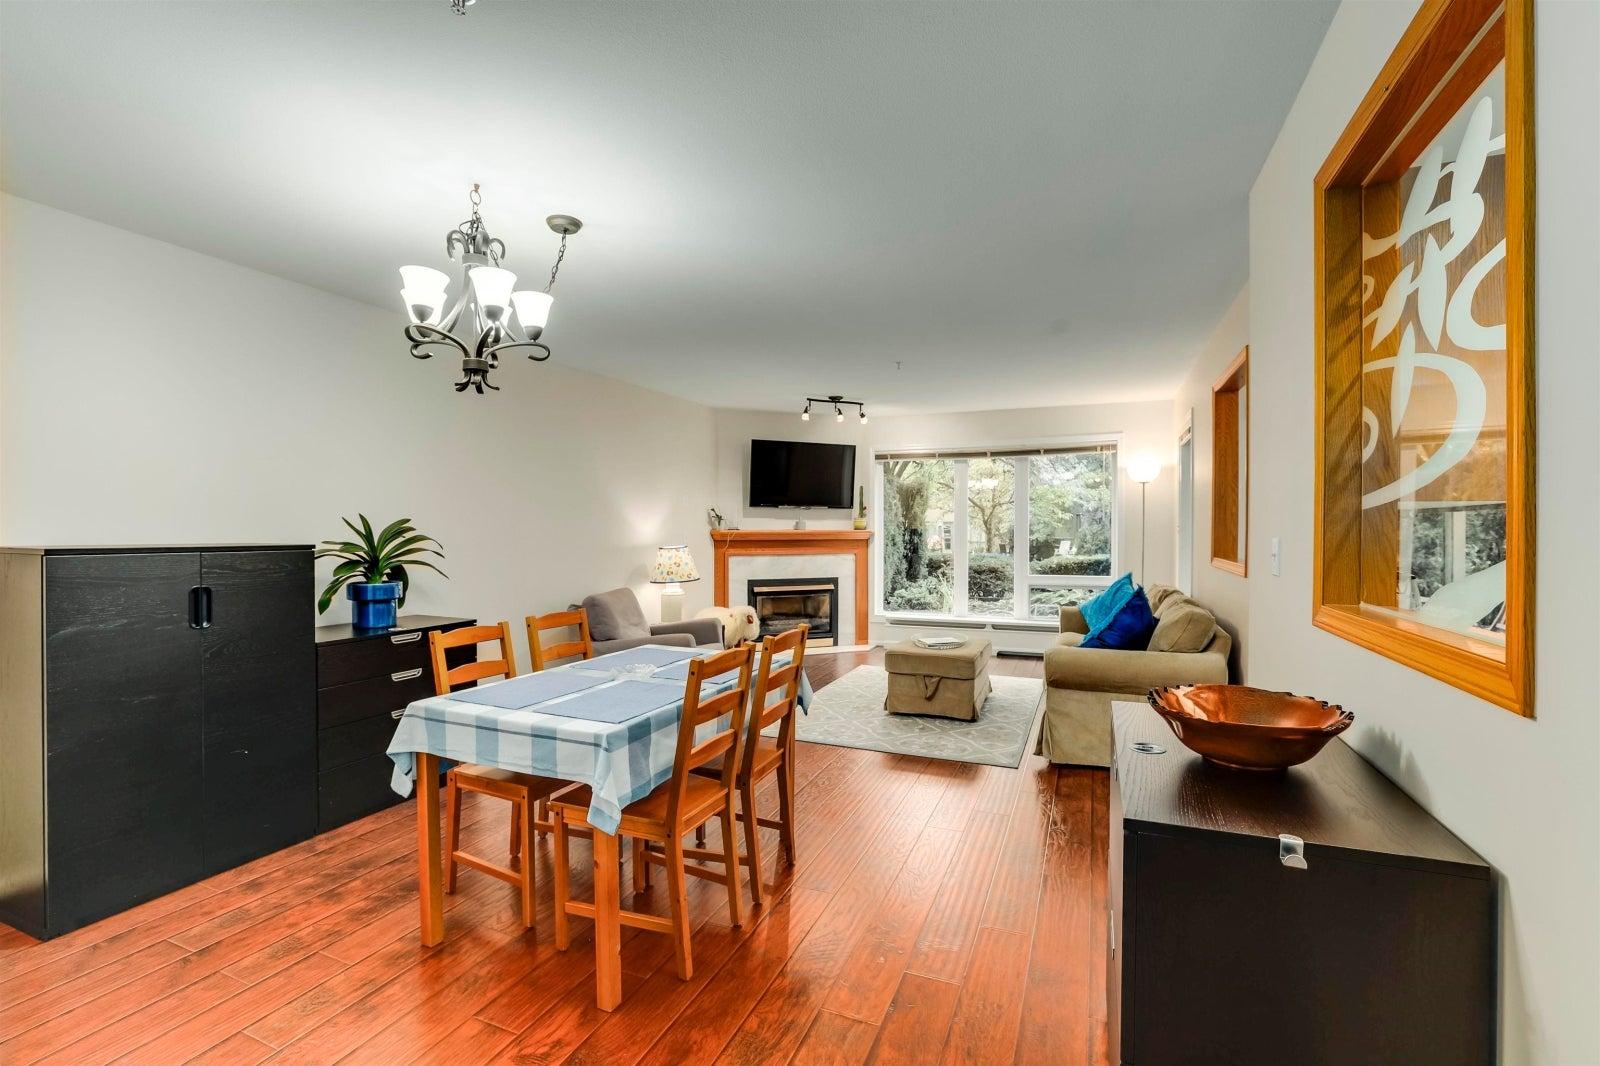 103 1132 DUFFERIN STREET - Eagle Ridge CQ Apartment/Condo for sale, 2 Bedrooms (R2618654) #6